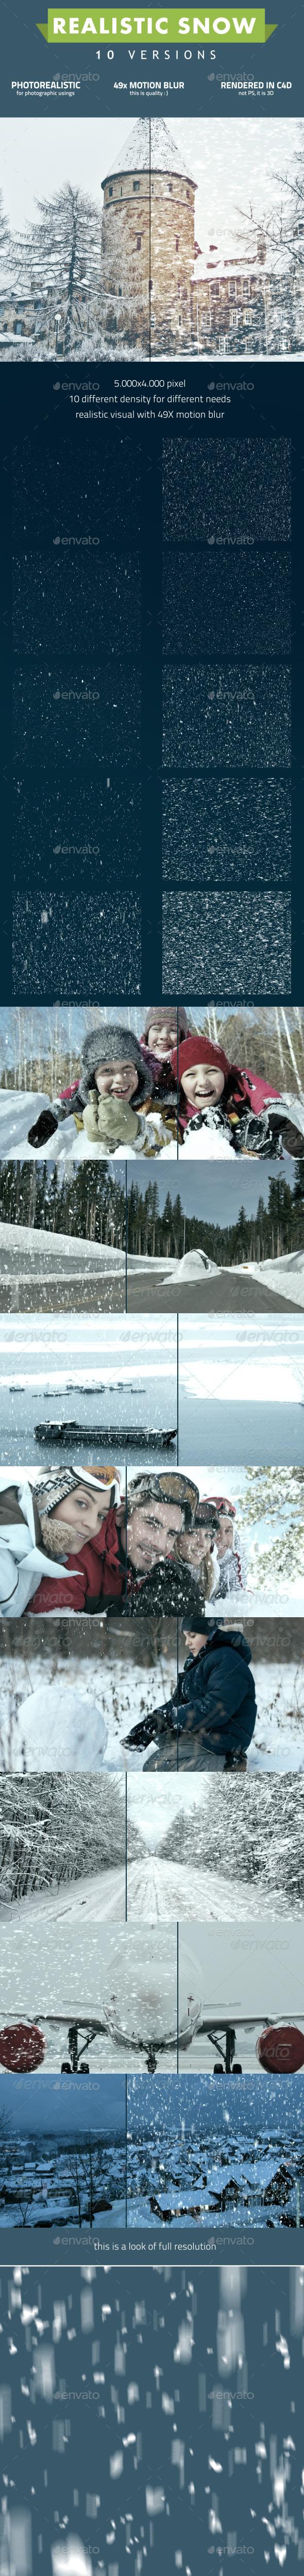 Snow - Seasonal Photo Templates